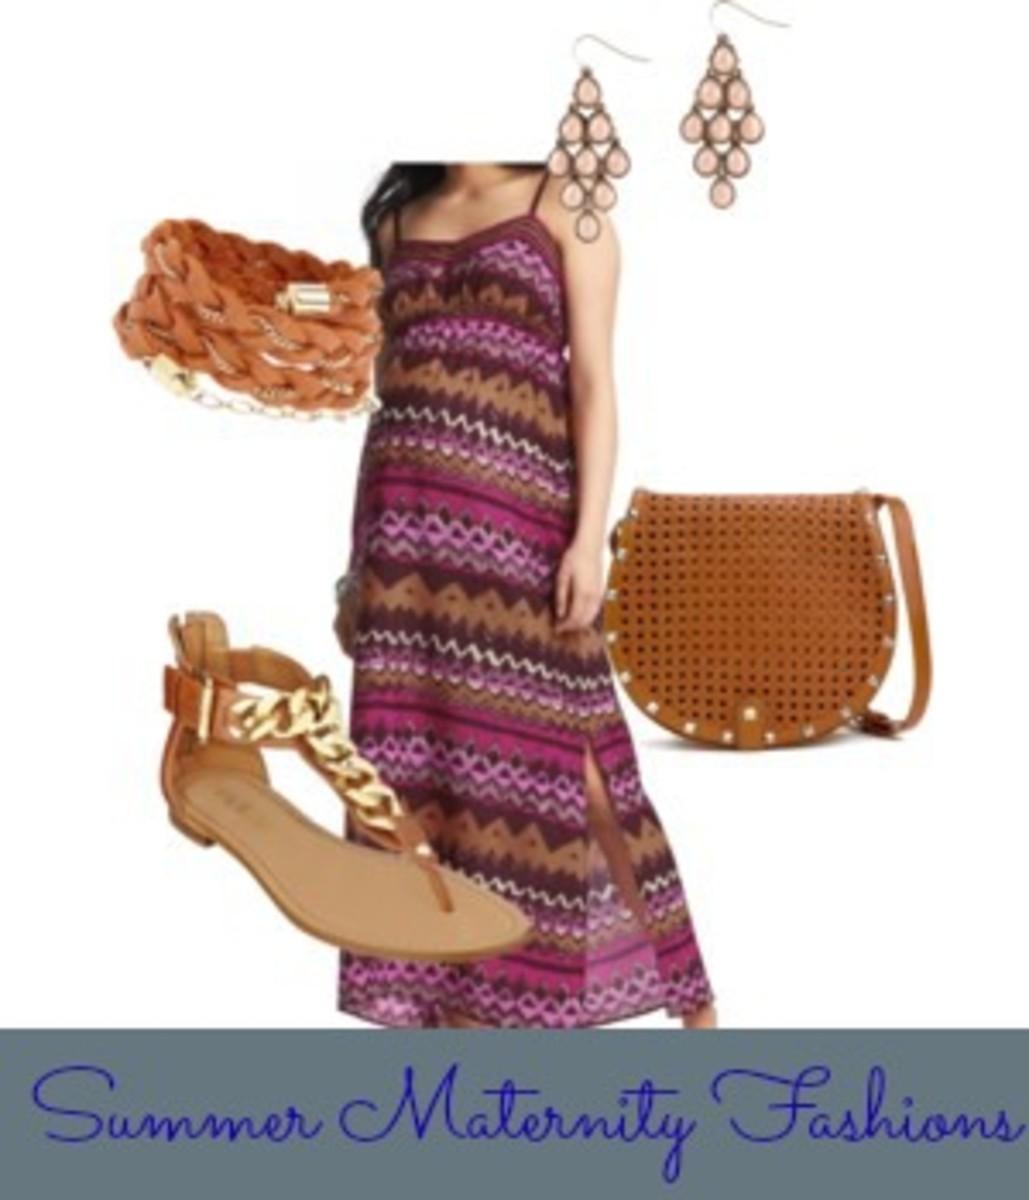 Summer Maternity Fashions, summer fashions